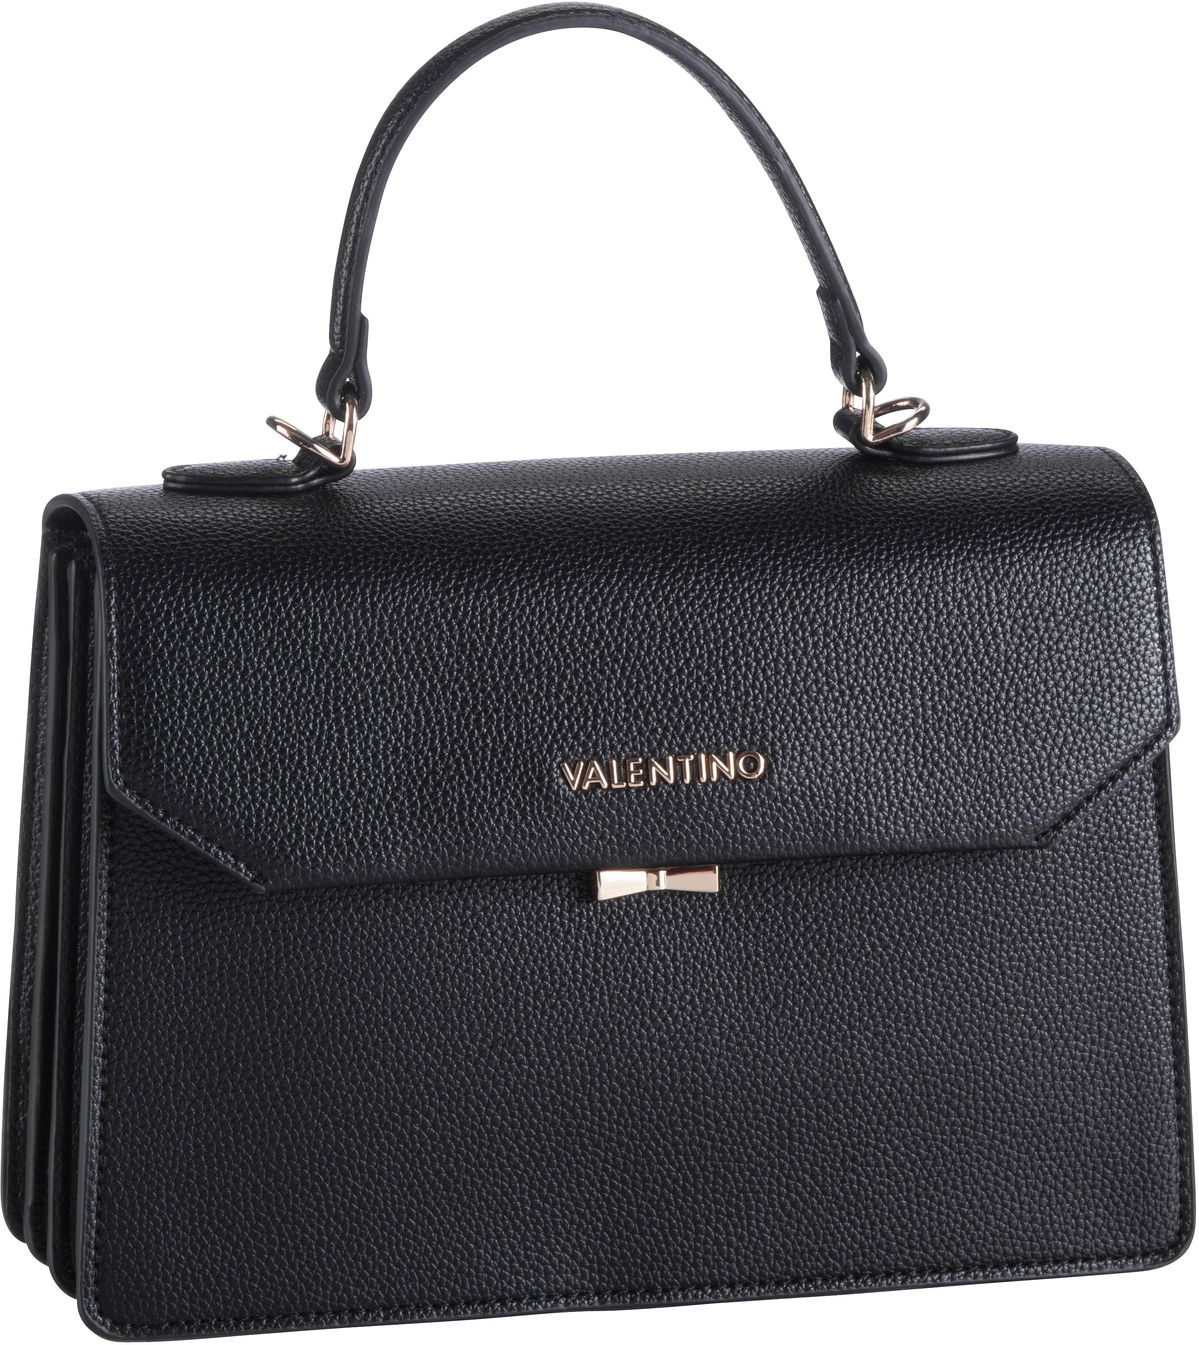 Bags Handtasche Sfinge Cartella O01 Nero